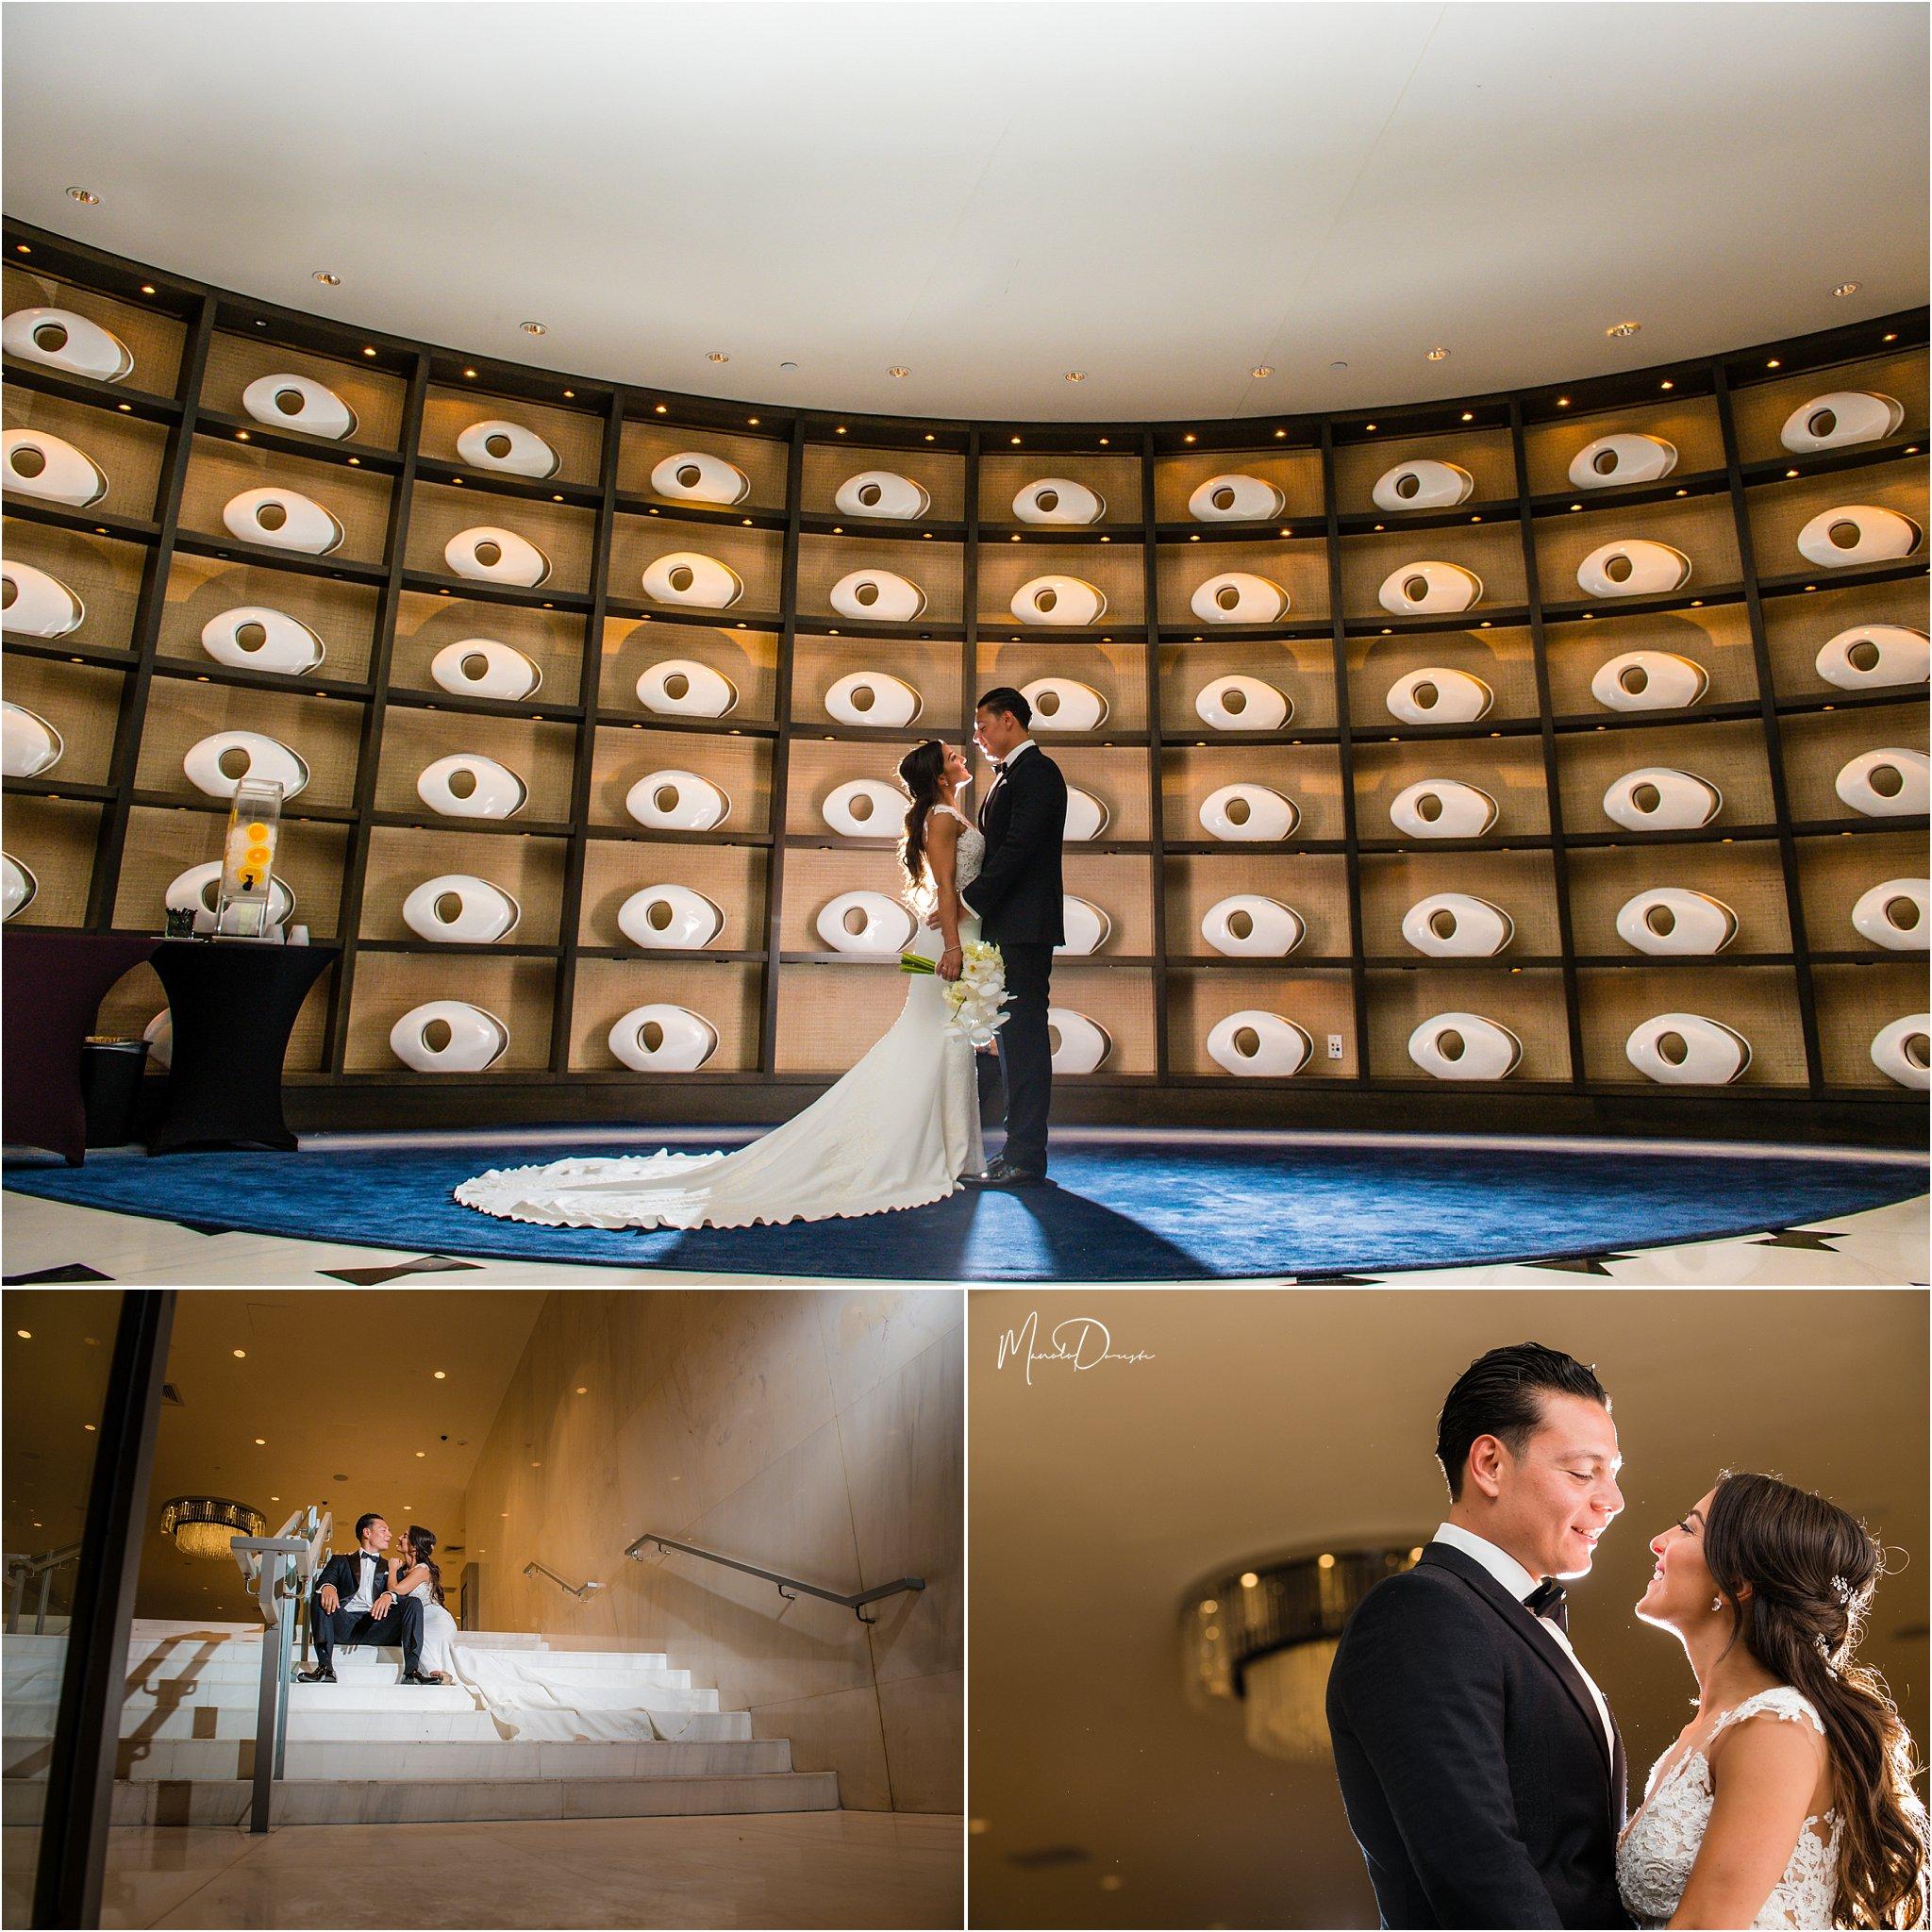 0324_ManoloDoreste_InFocusStudios_Wedding_Family_Photography_Miami_MiamiPhotographer.jpg